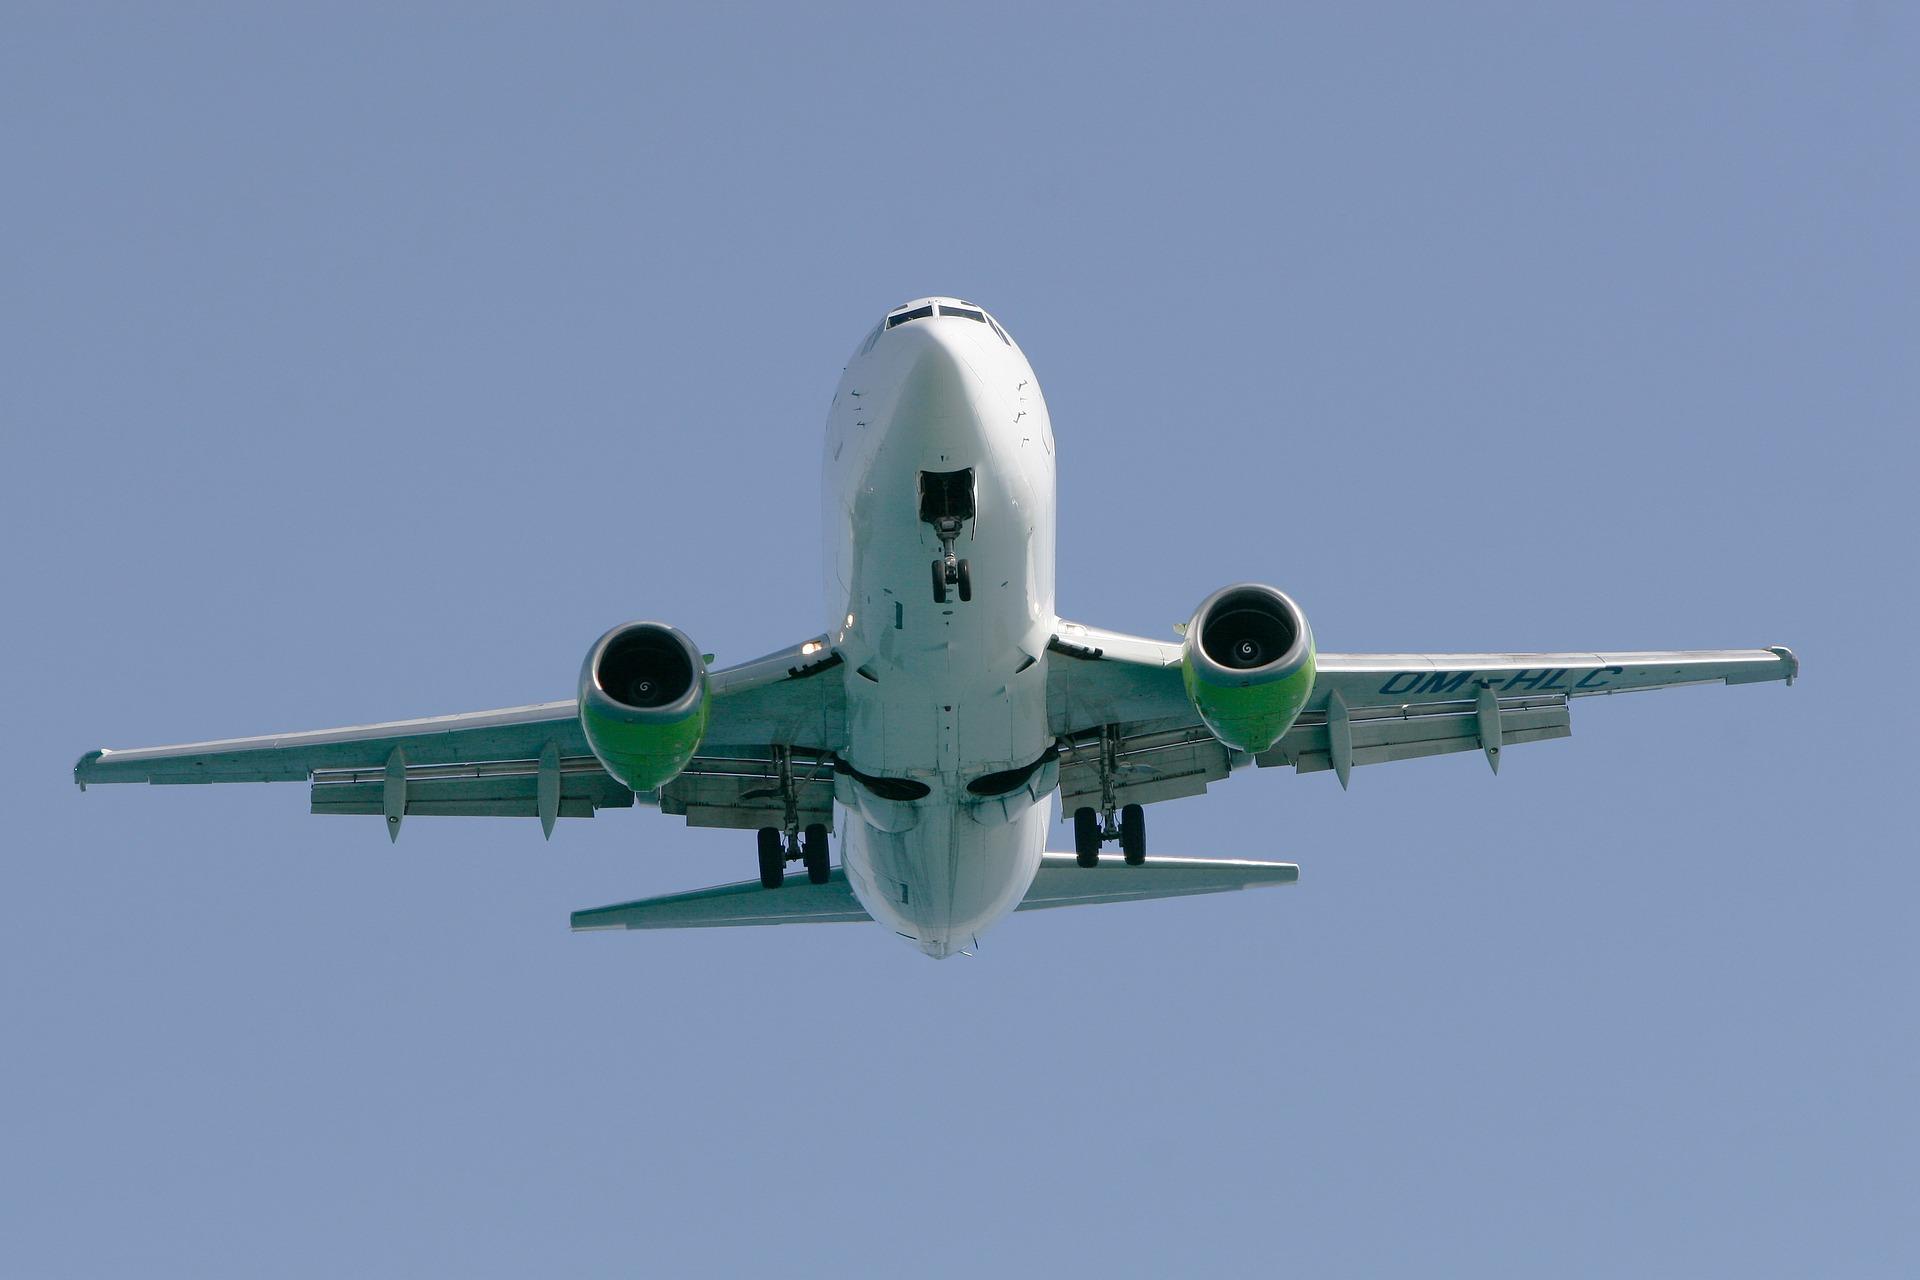 Mandatory COVID-19 test for chartered flight passengers to Kerala